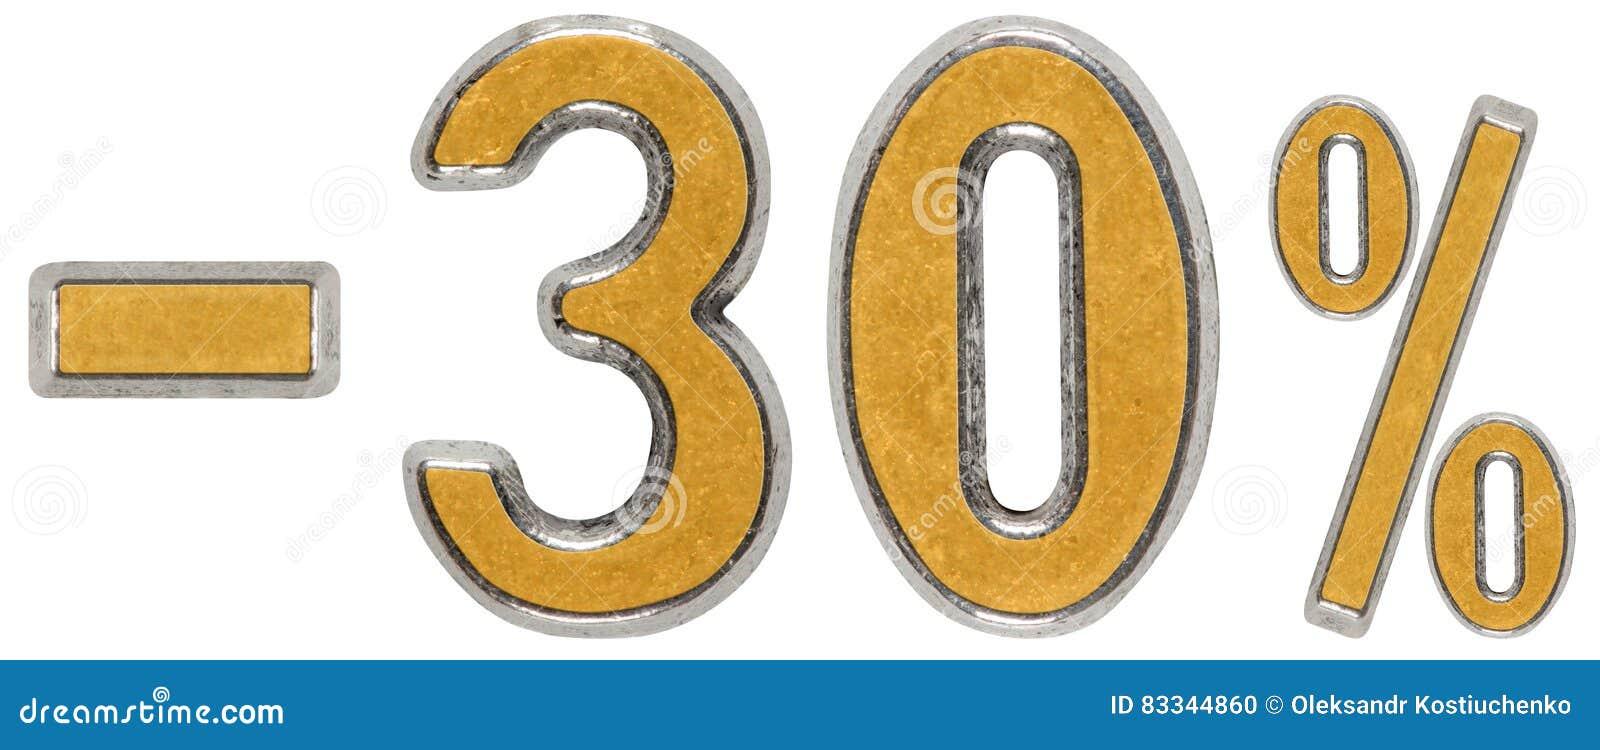 Percenten weg korting Minus 30, dertig, drie, percenten Metaal